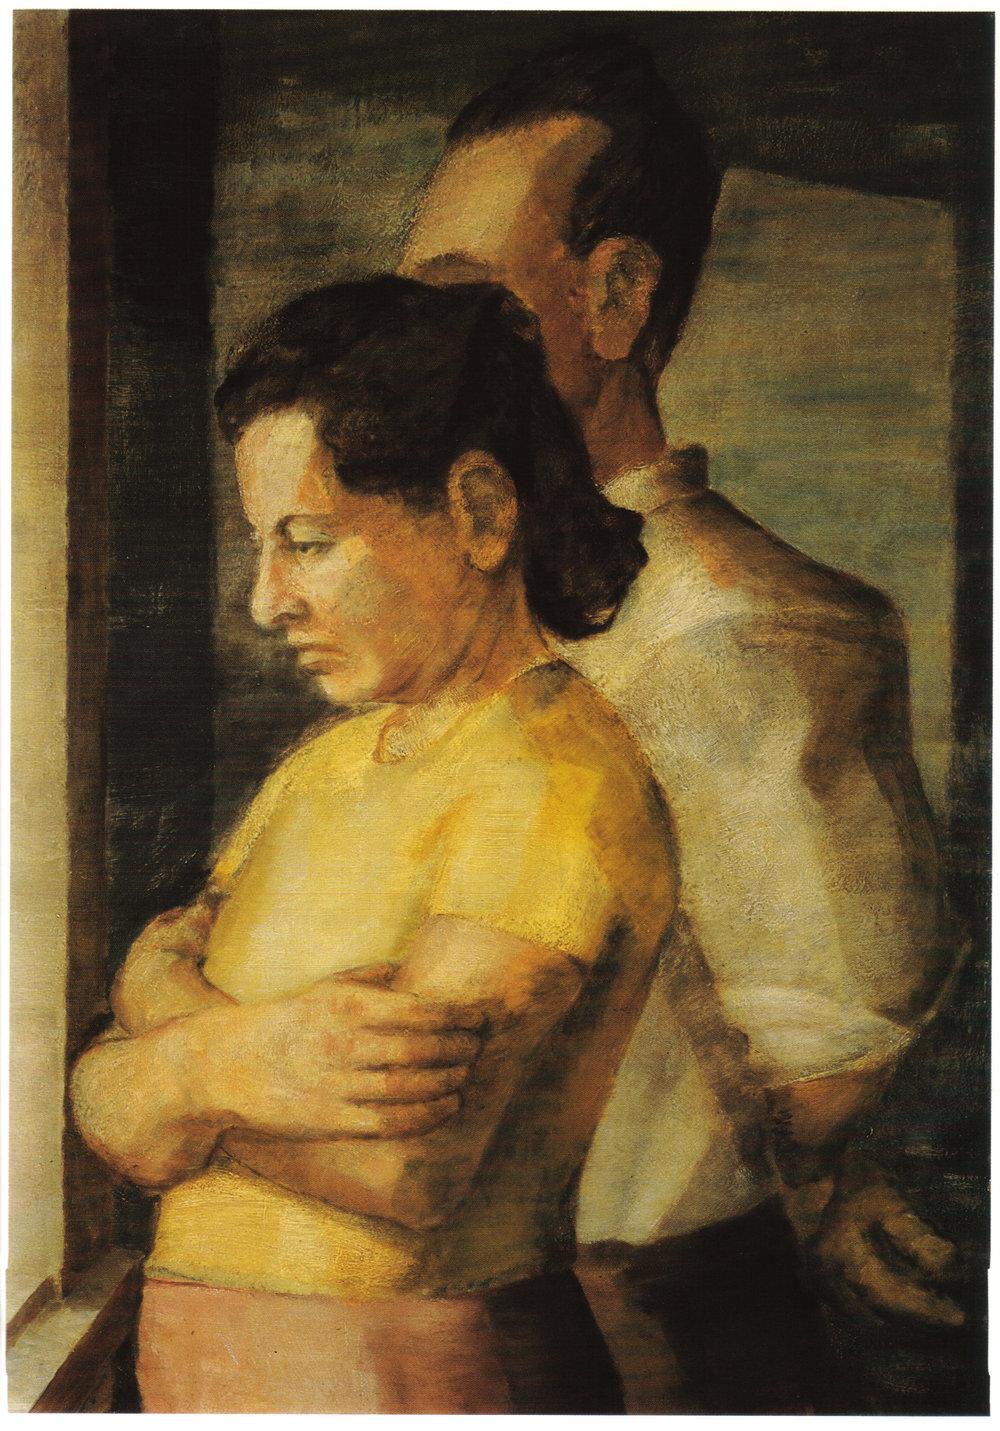 2. 1943, Double Portrait of the Artist's Parents, Oil on masonite, 25x18, 1943.jpg